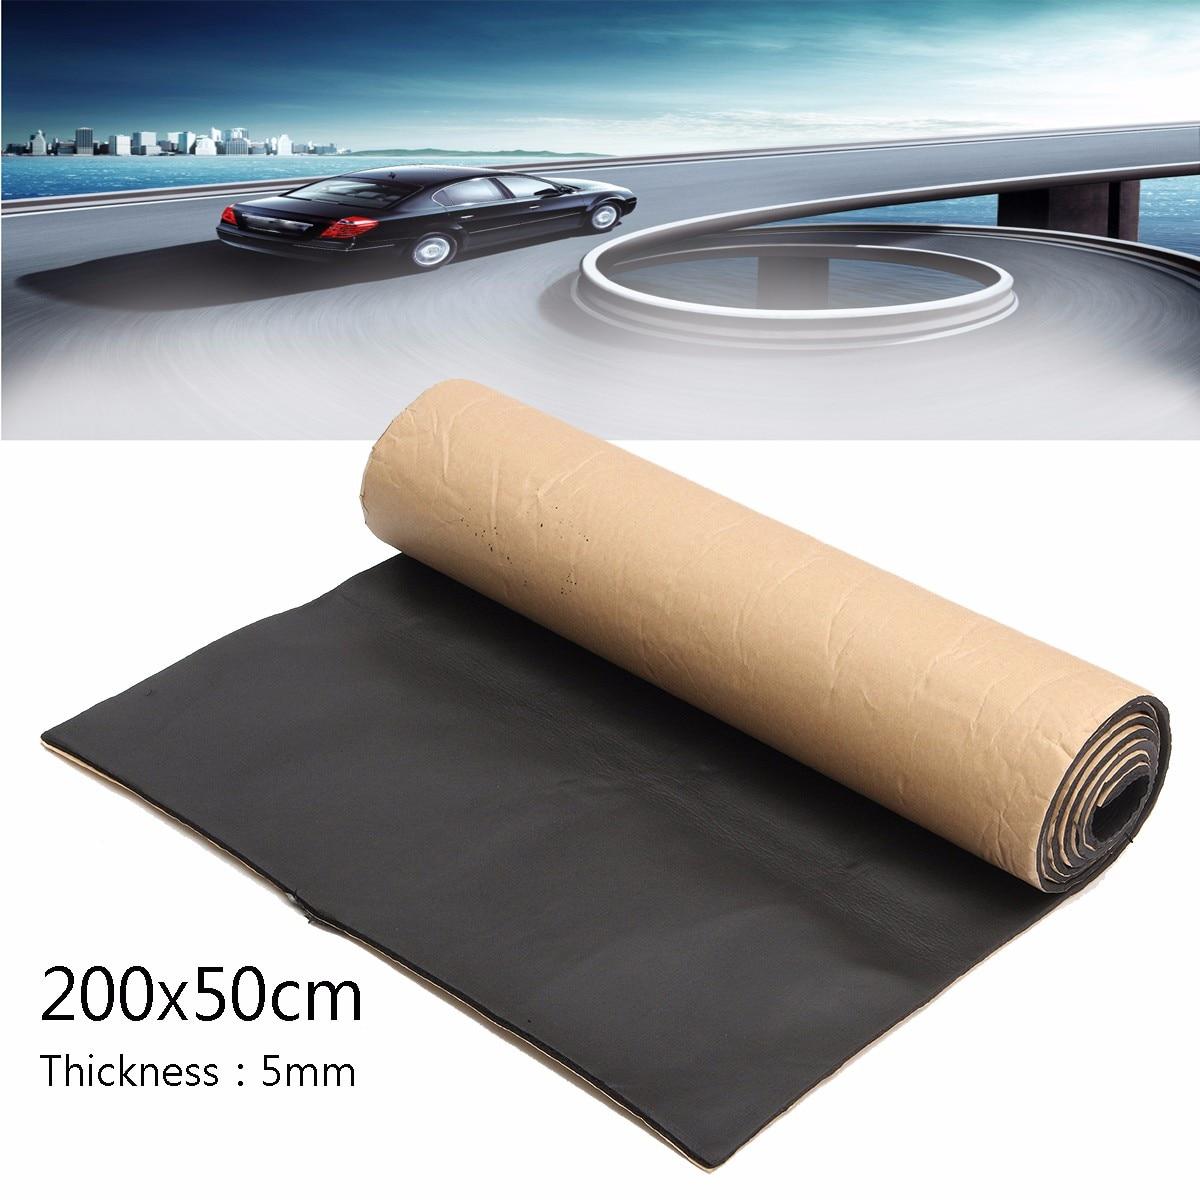 1roll-200cmx50cm-car-sound-proofing-deadening-anti-noise-sound-insulation-cotton-heat-closed-cell-foam-interior-accessories